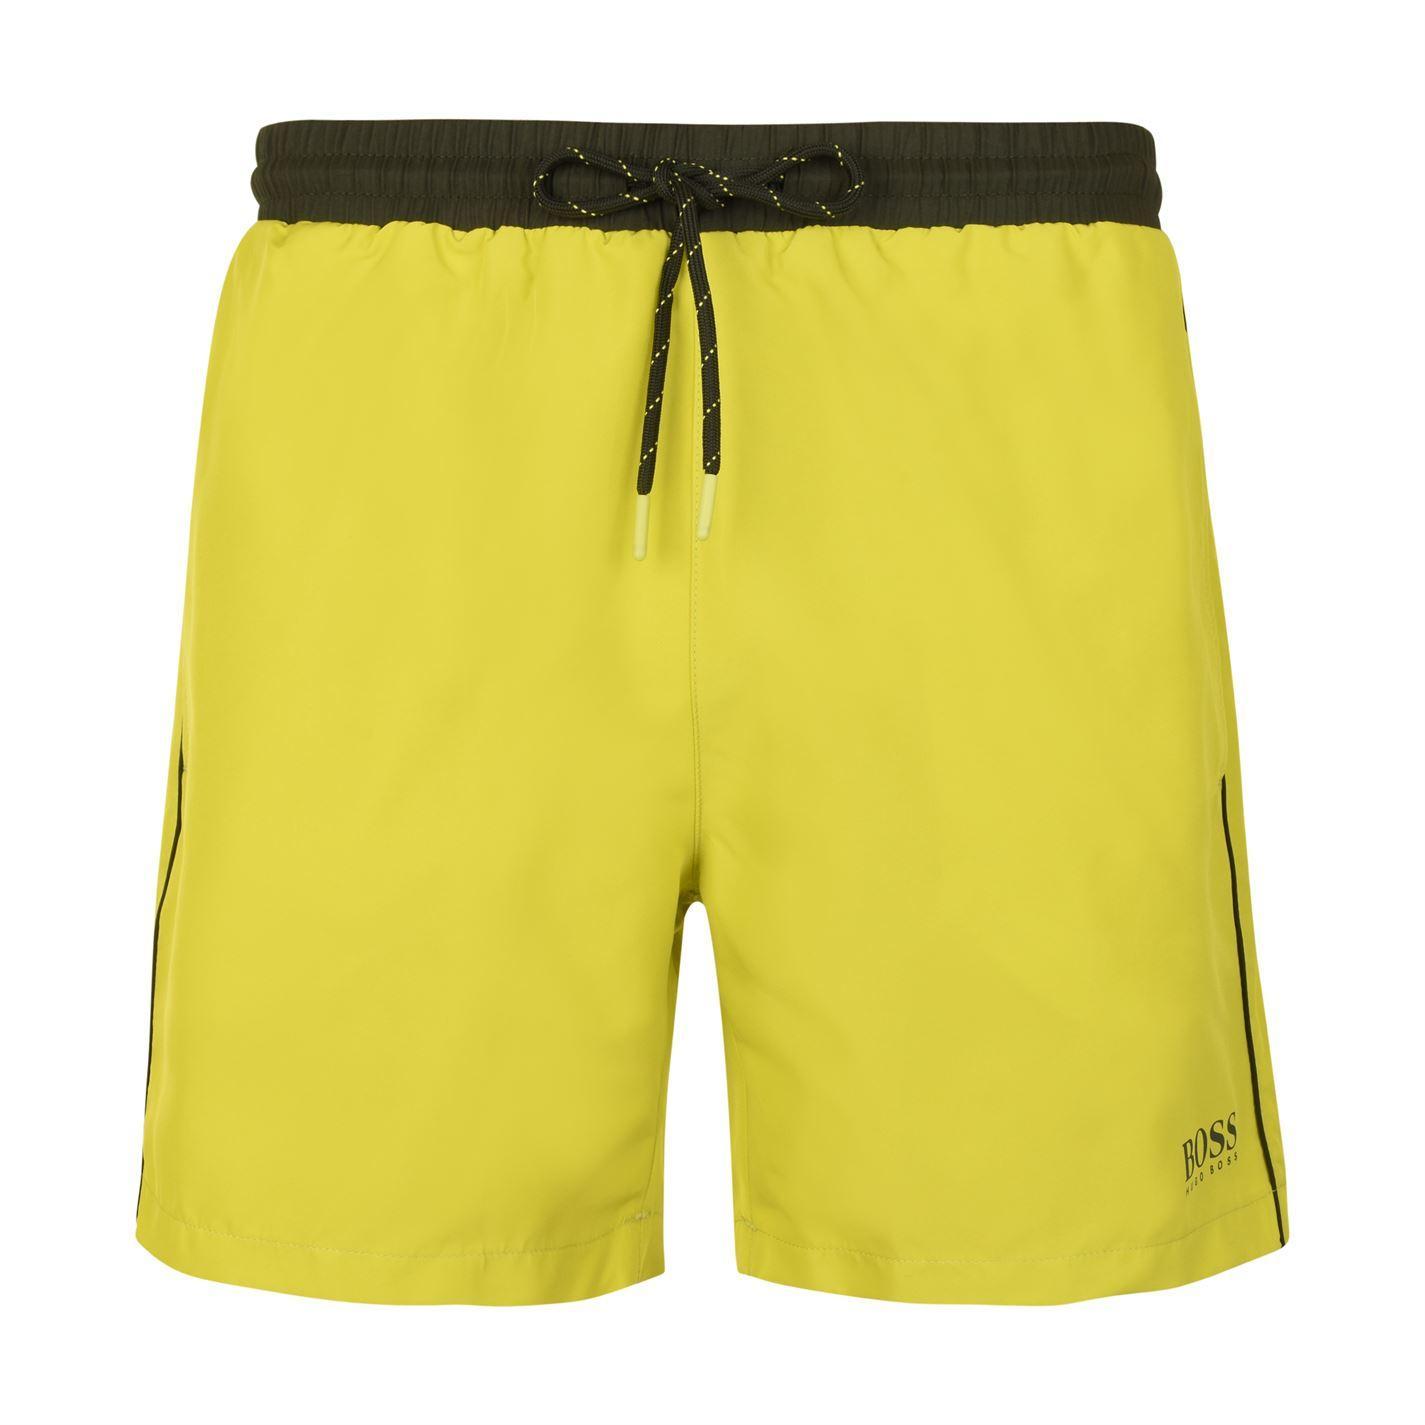 a36ef496 Lyst - BOSS by Hugo Boss Starfish Swim Shorts in Yellow for Men